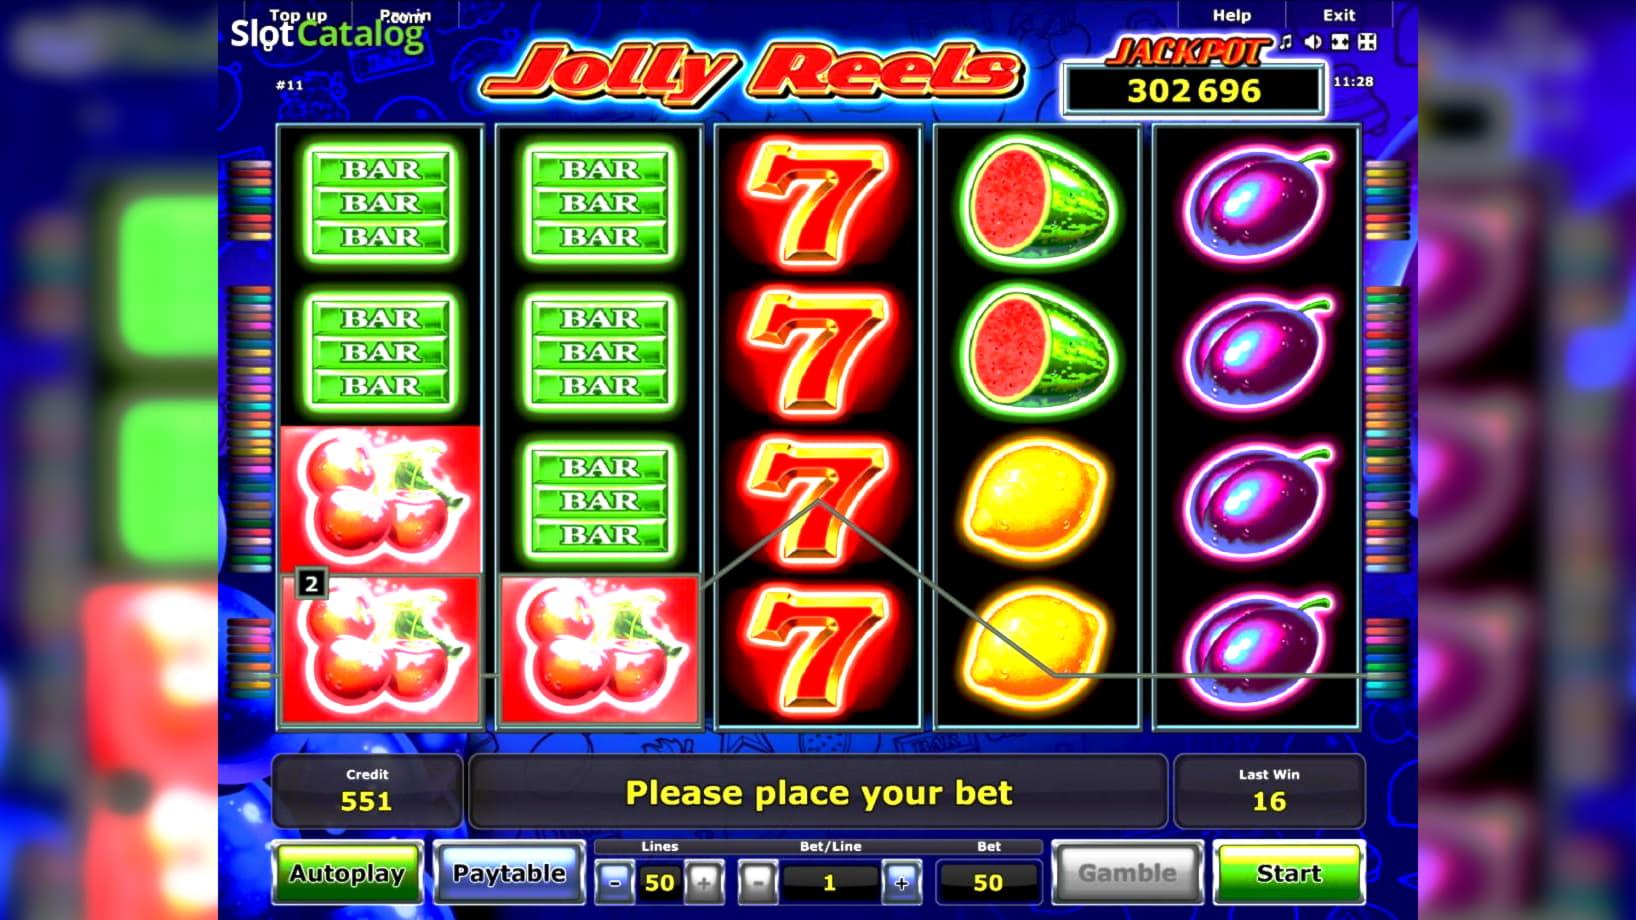 casinogamesonlinefreefun euweuh deposit